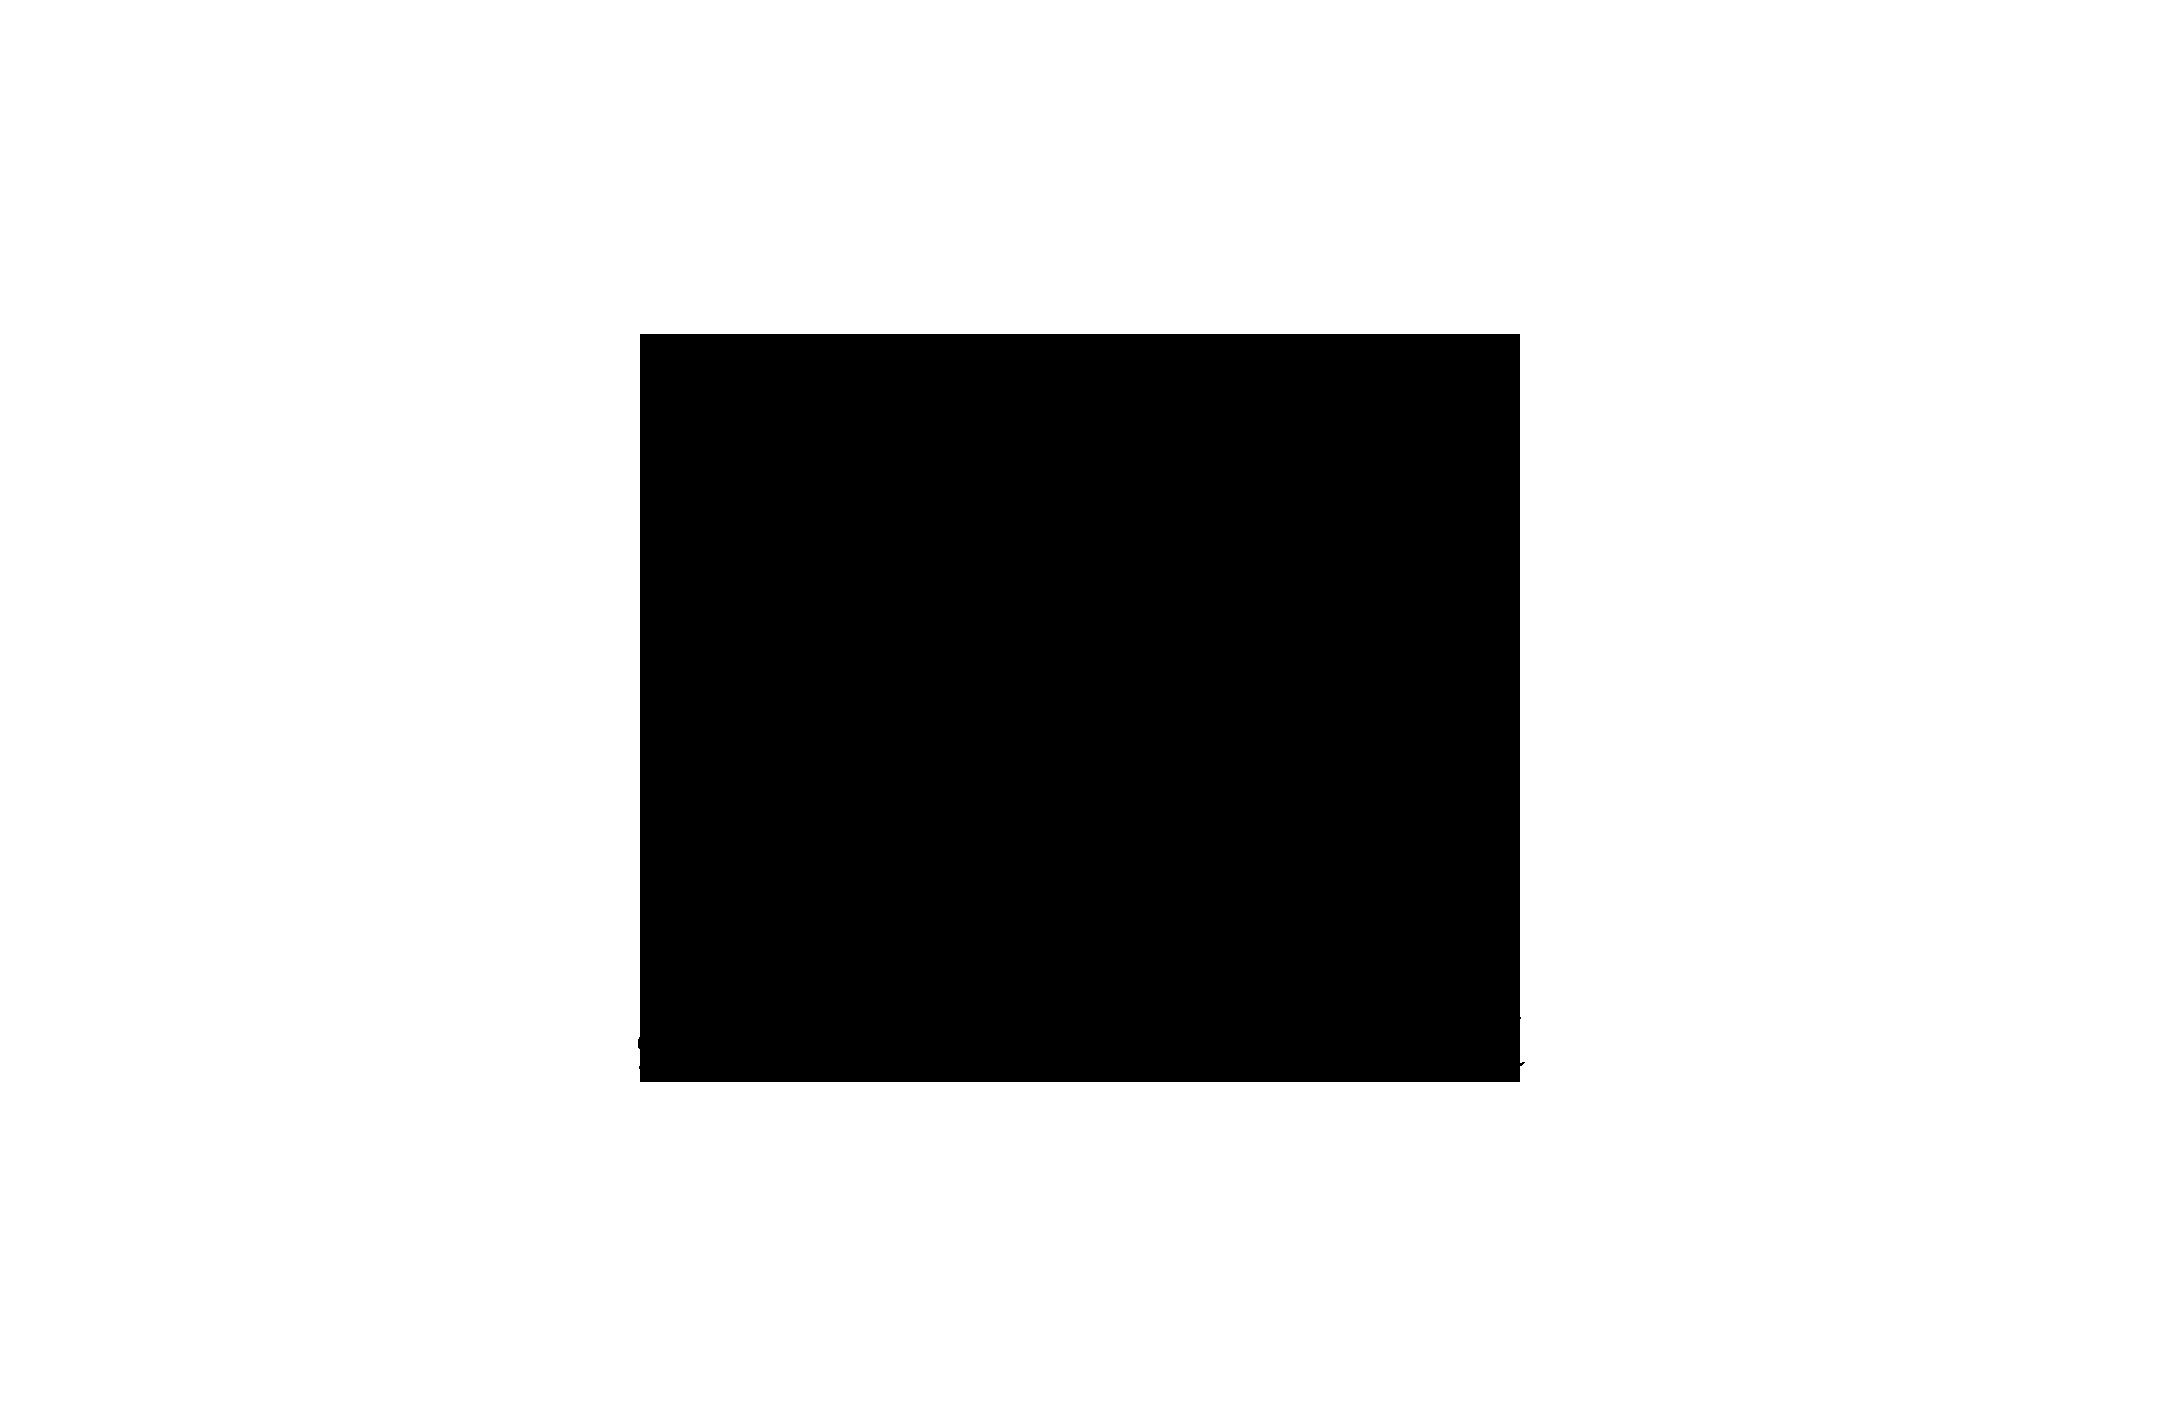 Lichtstadt Feldkirch Partner Schertler Logo